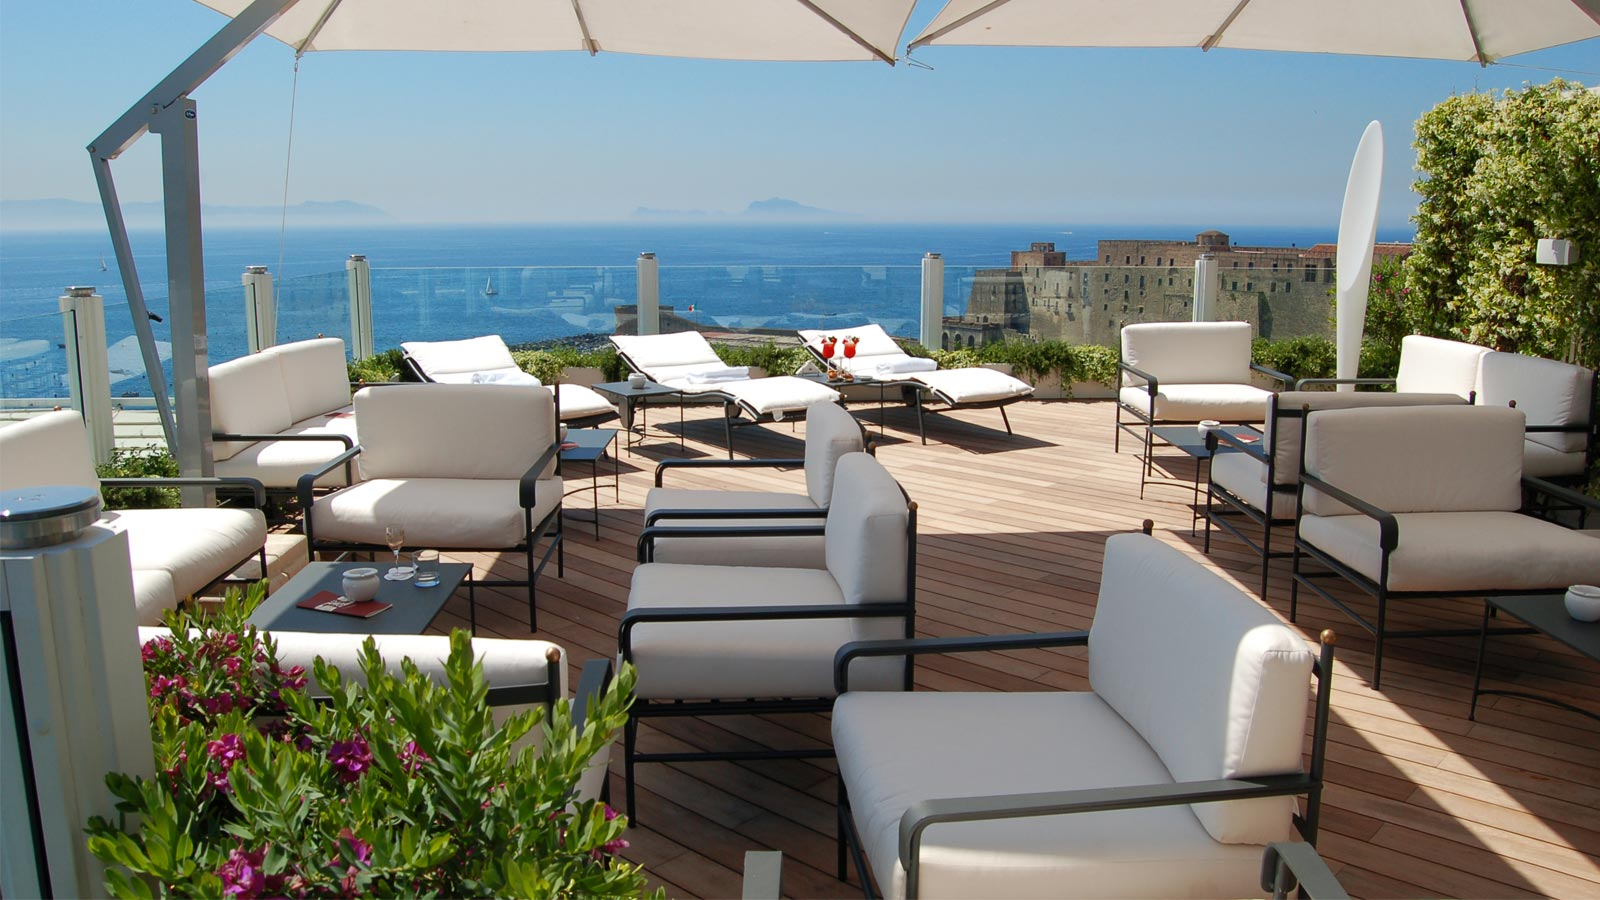 Hotel Excelsior Italy Campania Napoli Tripinview